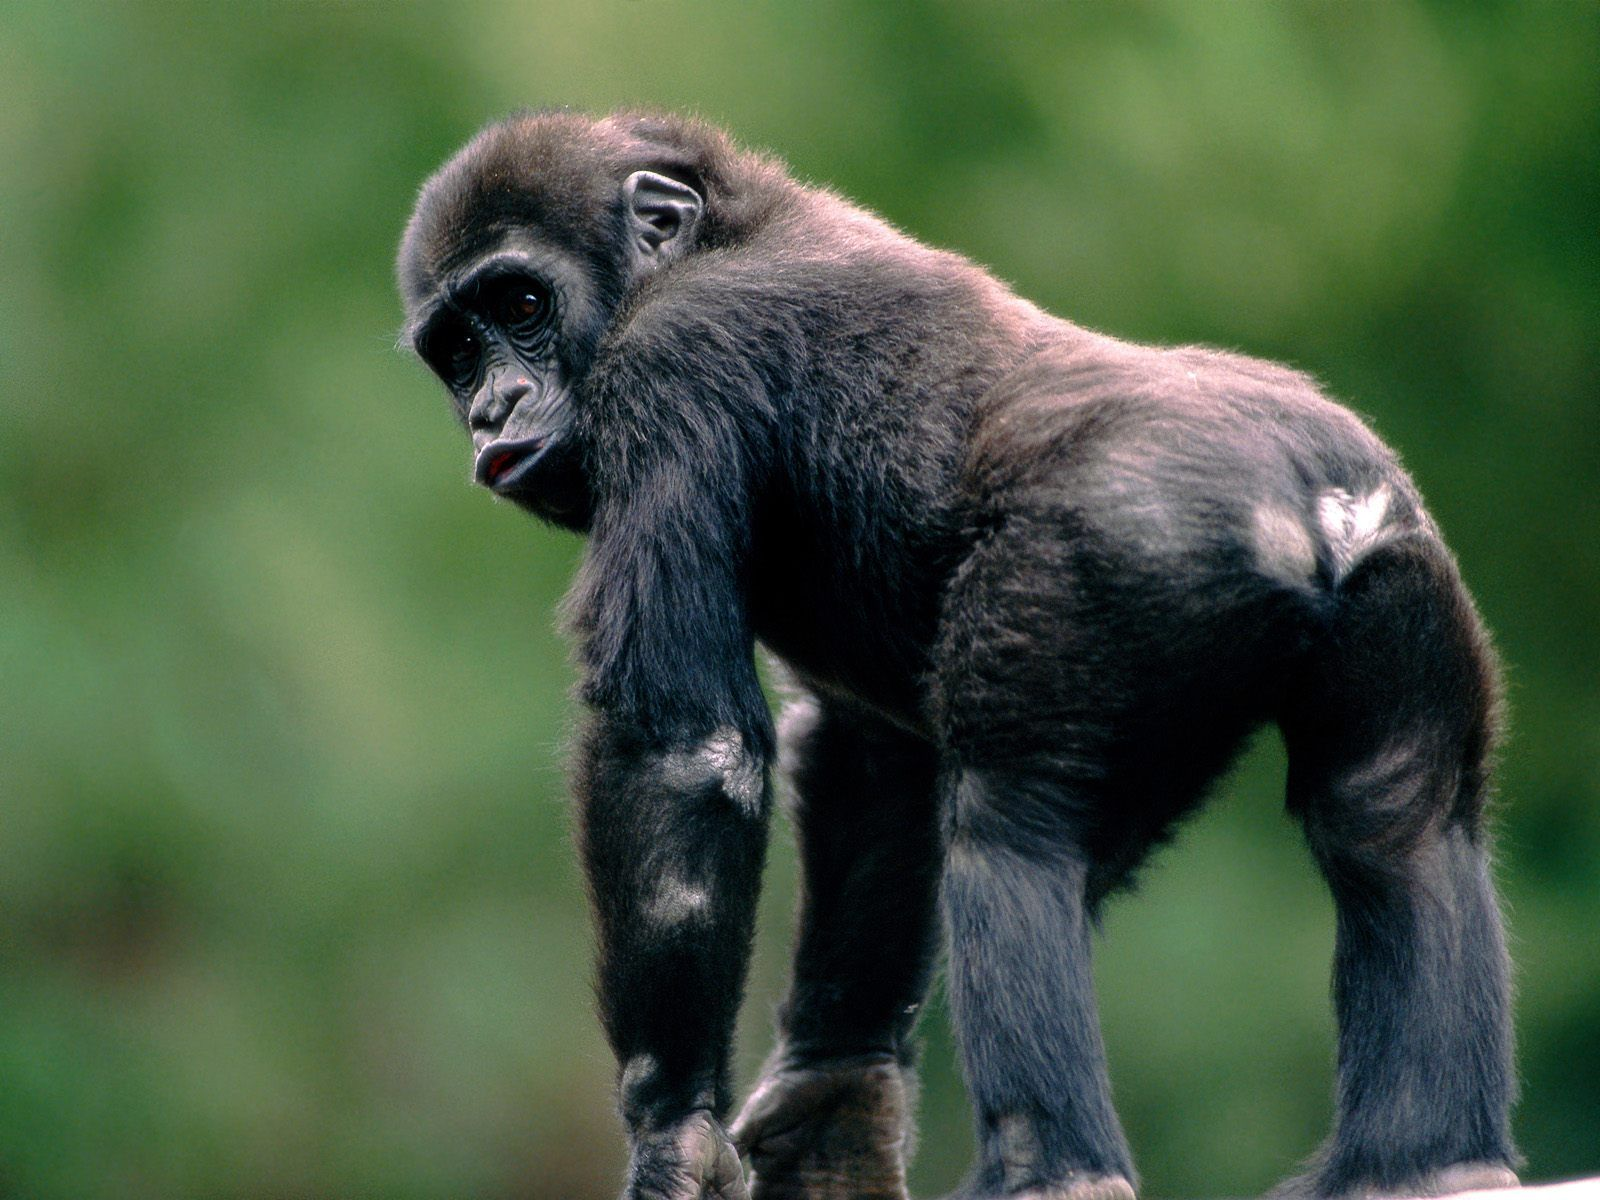 amazing baby monkey hd desktop background wallpaper free photos